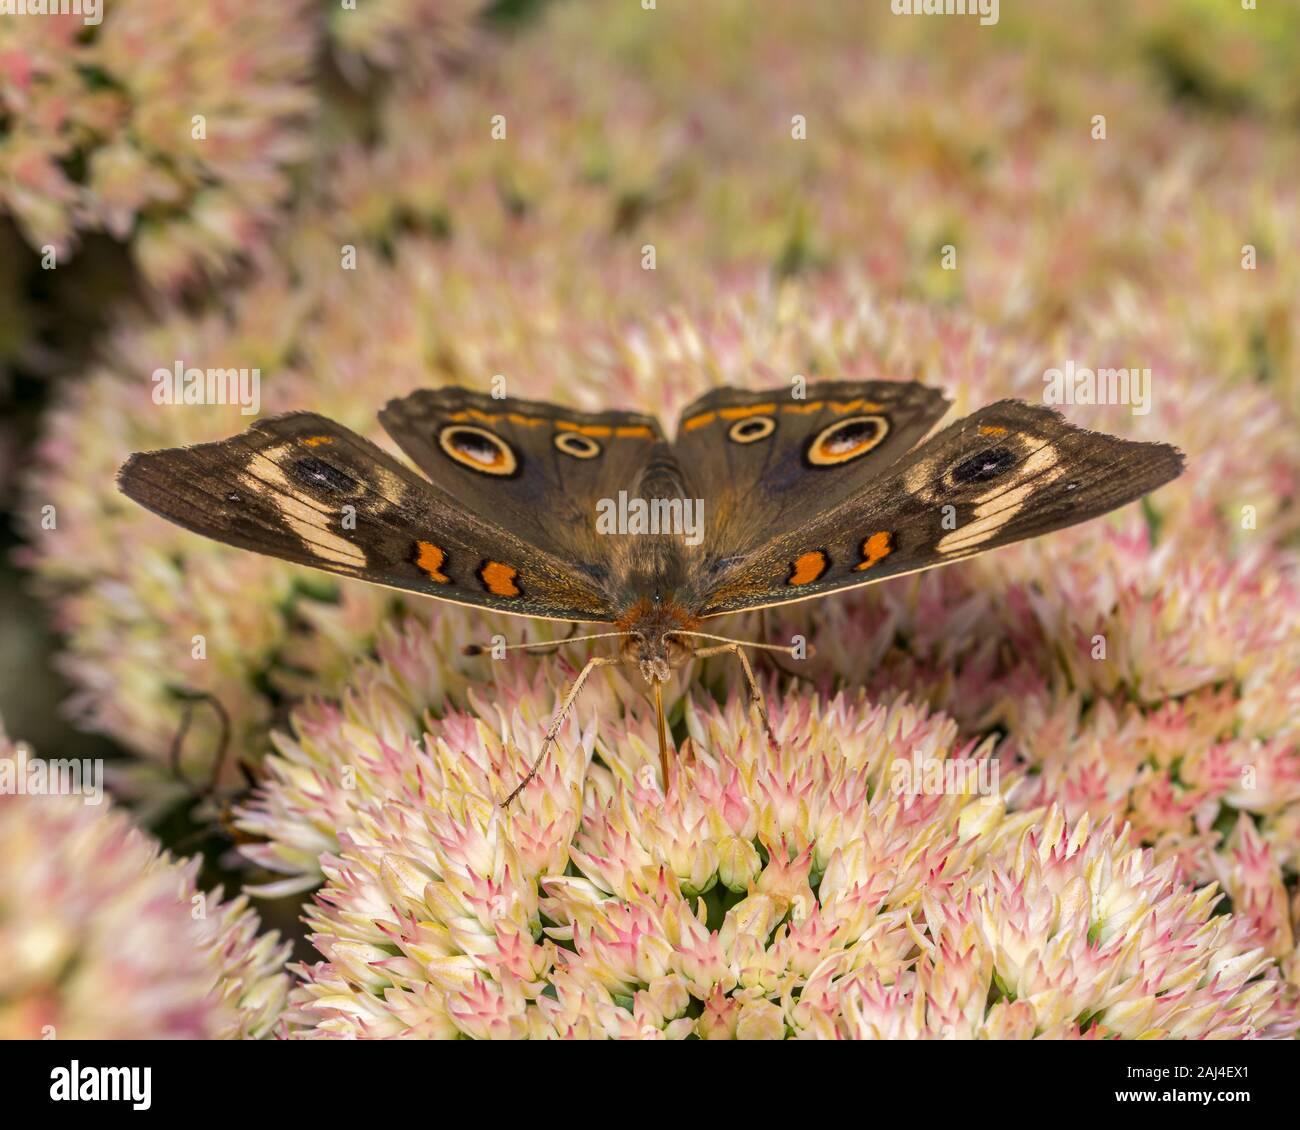 Closeup view of Common Buckeye butterfly feeding on nectar from sedum stonecrops plant in backyard flower garden Stock Photo